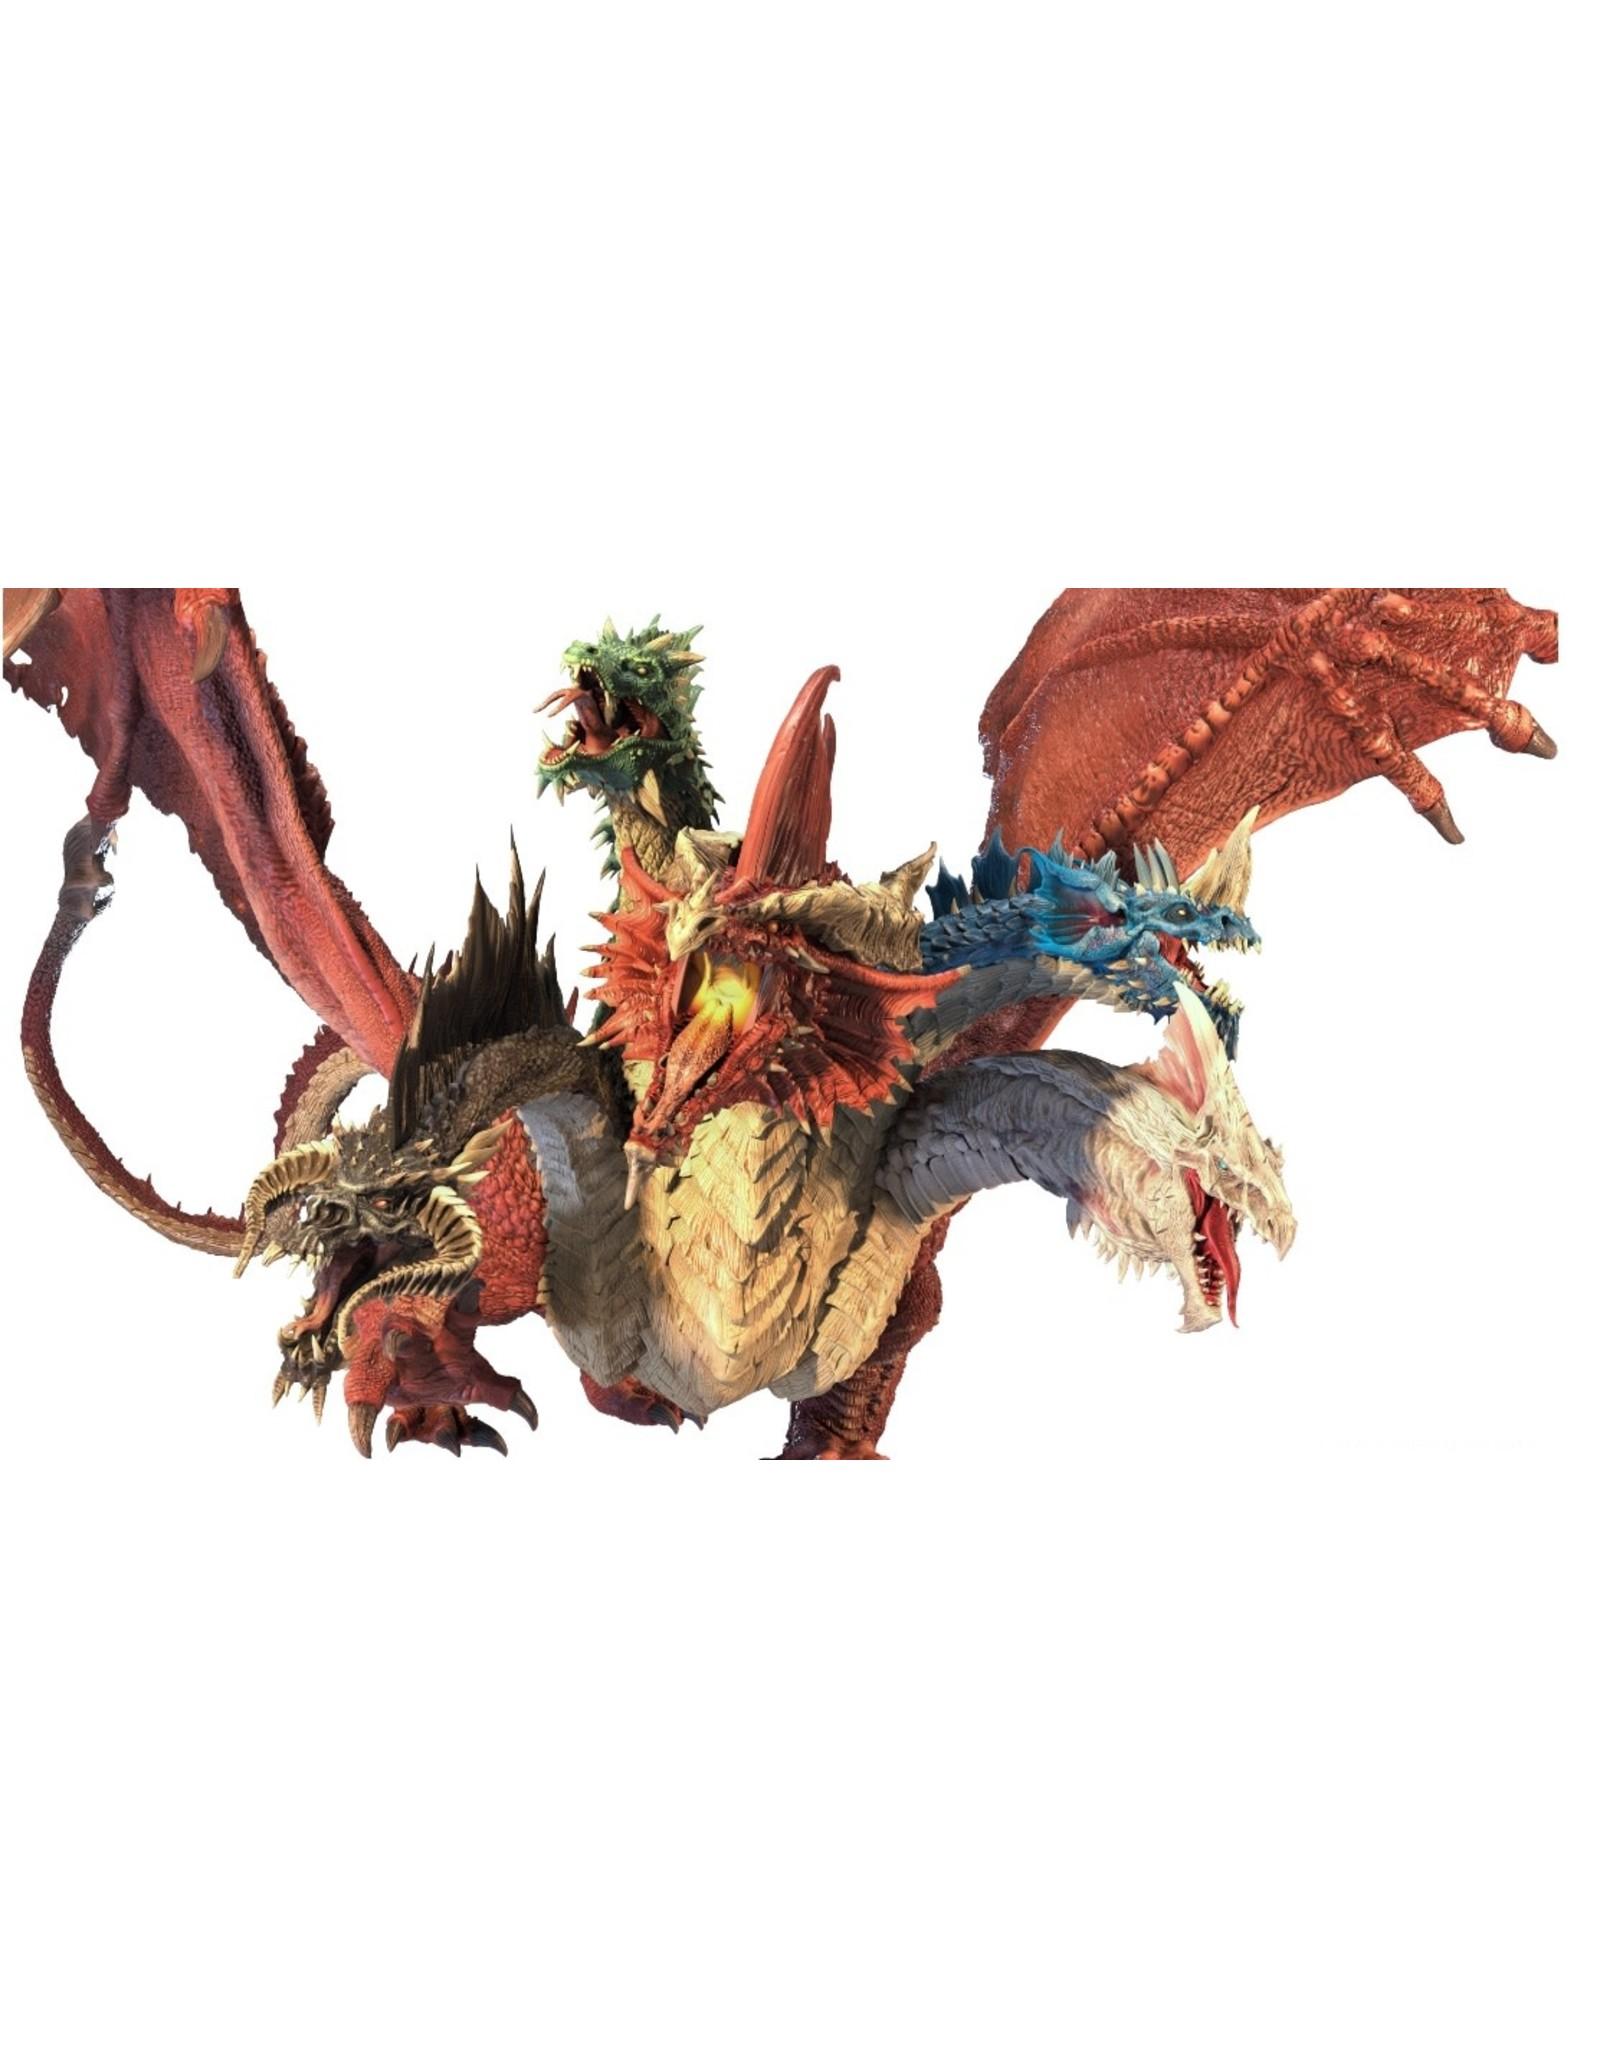 WizKids Dungeons & Dragons Fantasy Miniatures: Icons of the Realms Gargantuan Tiamat